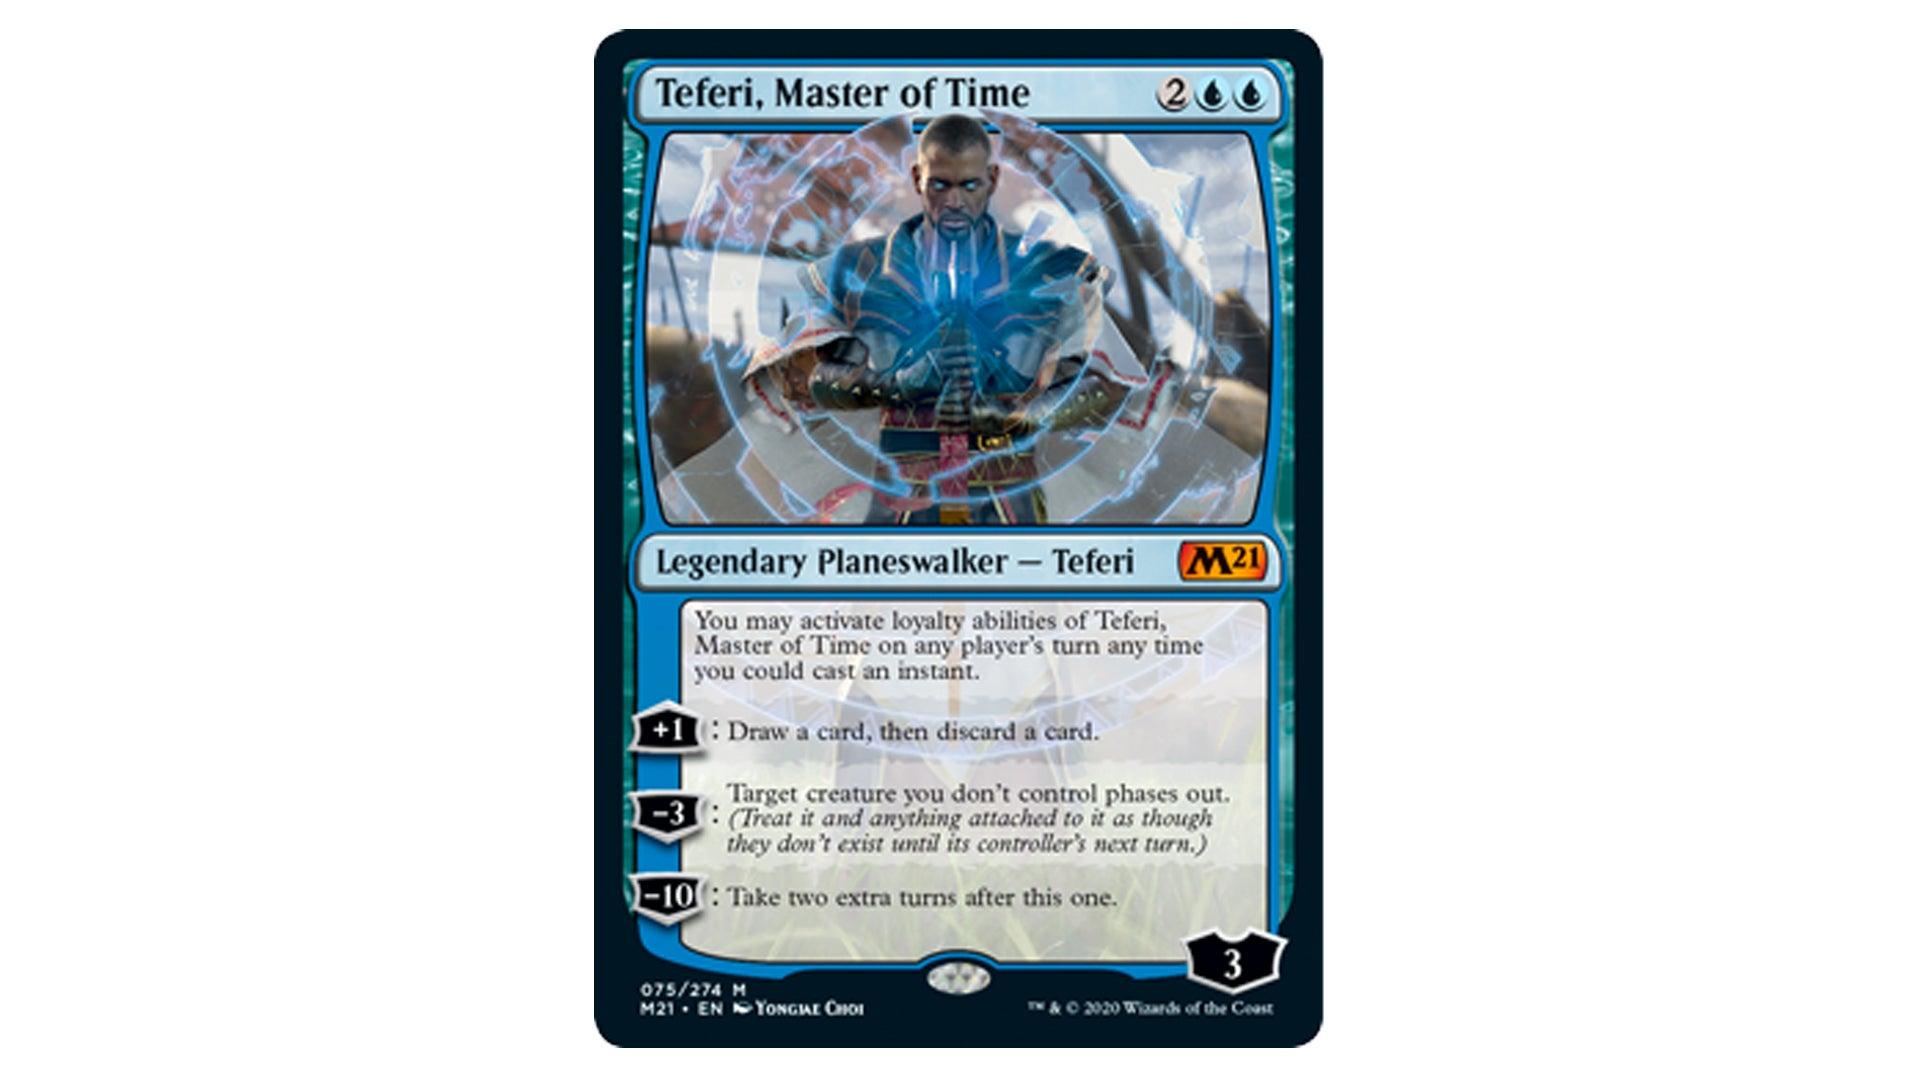 mtg-m21-card-teferi-master-of-time.jpg